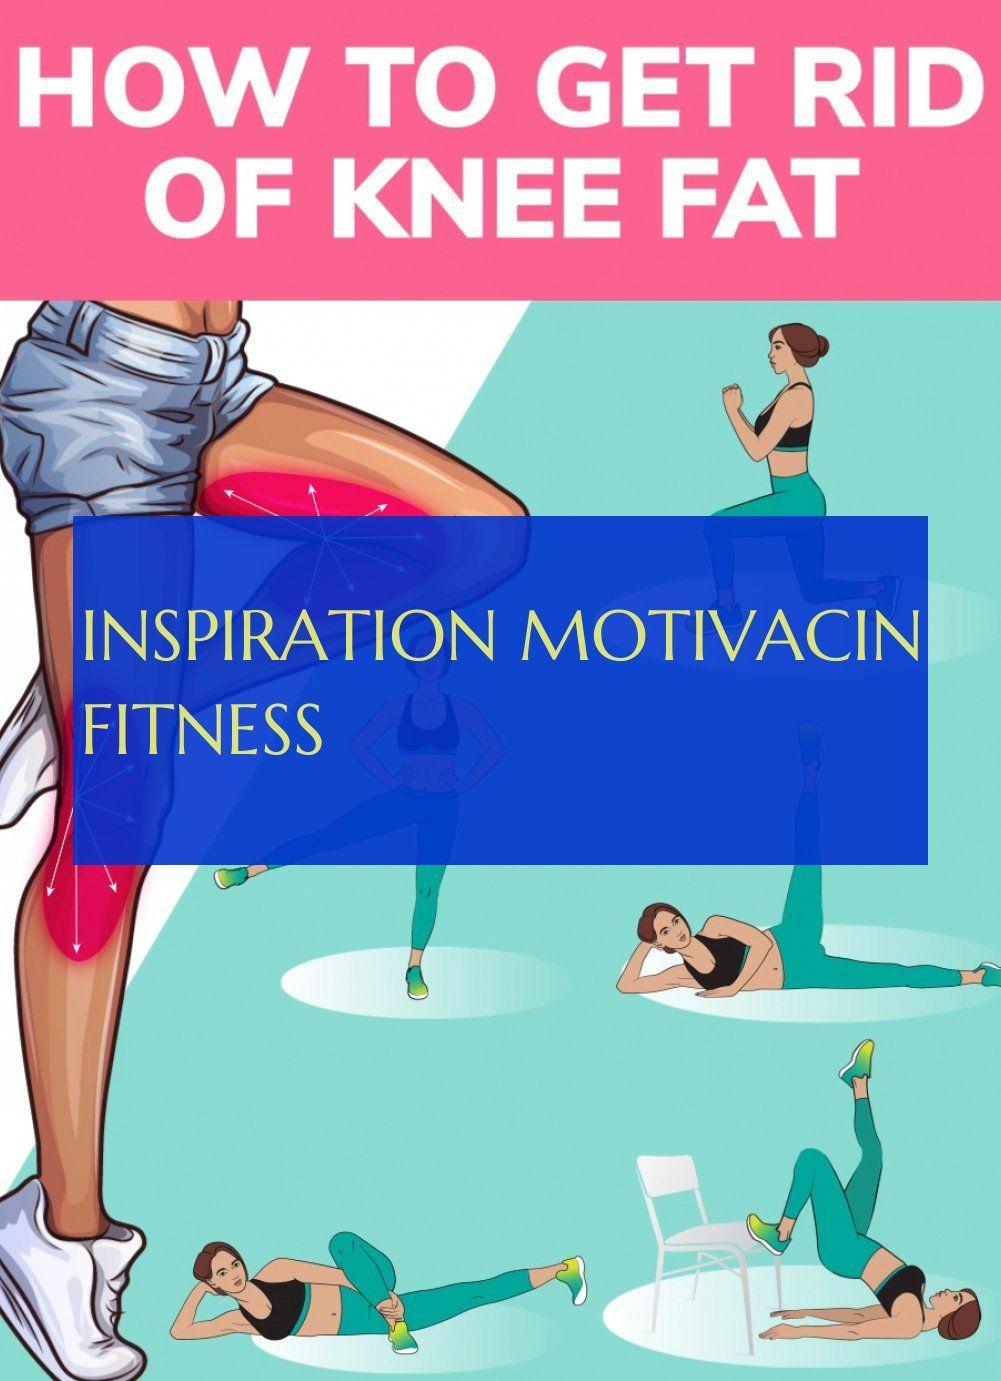 Inspiration motivacin fitness #Inspiration #motivacin #fitness